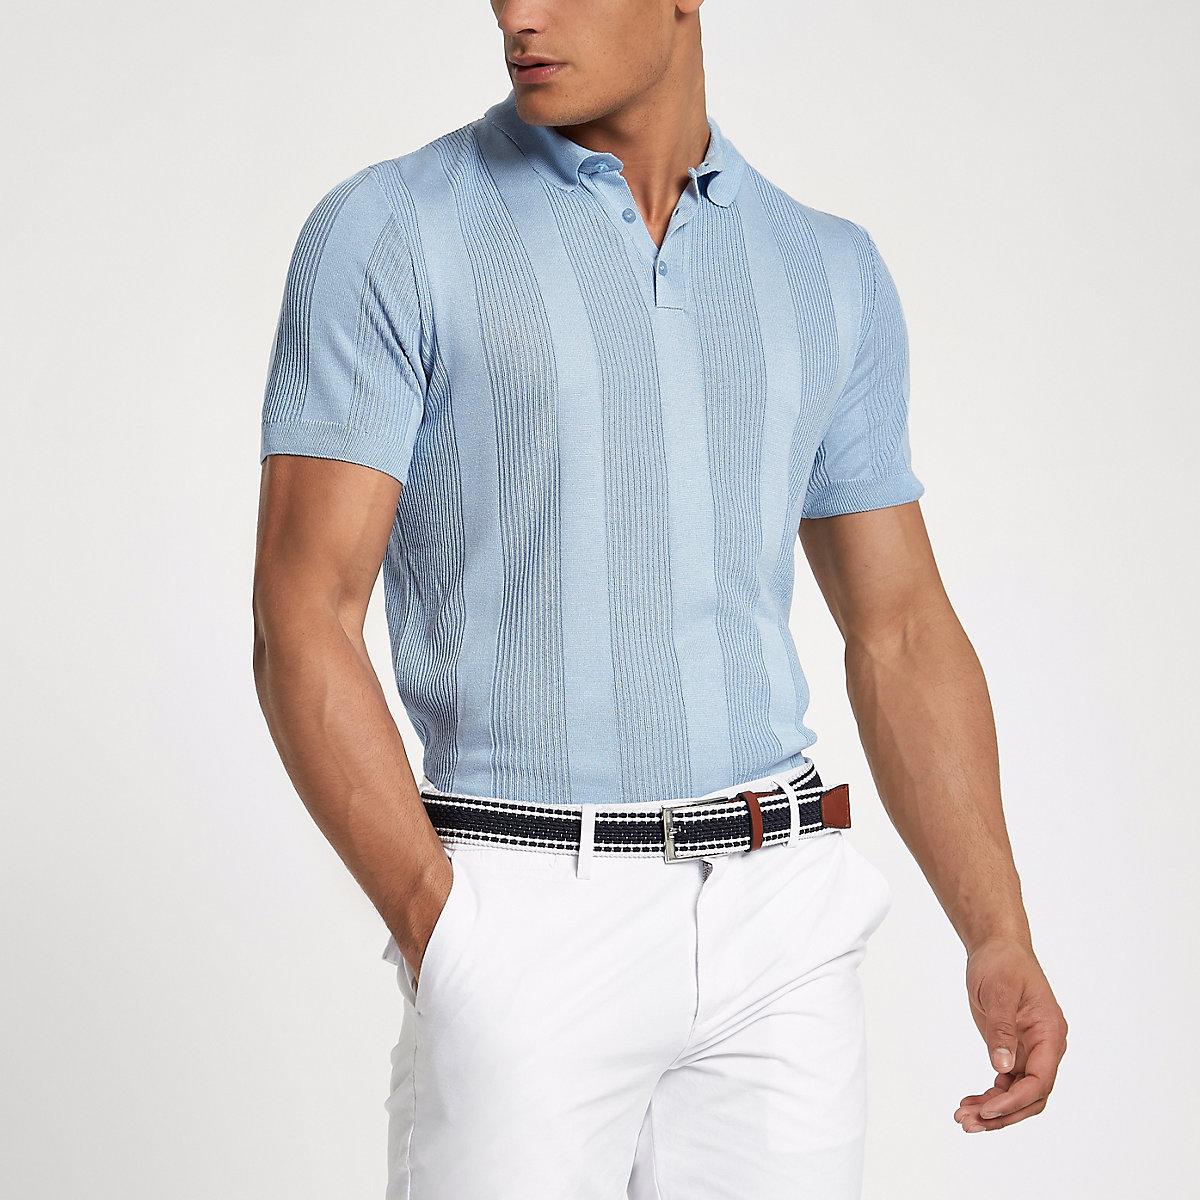 Blue rib knit muscle fit polo shirt